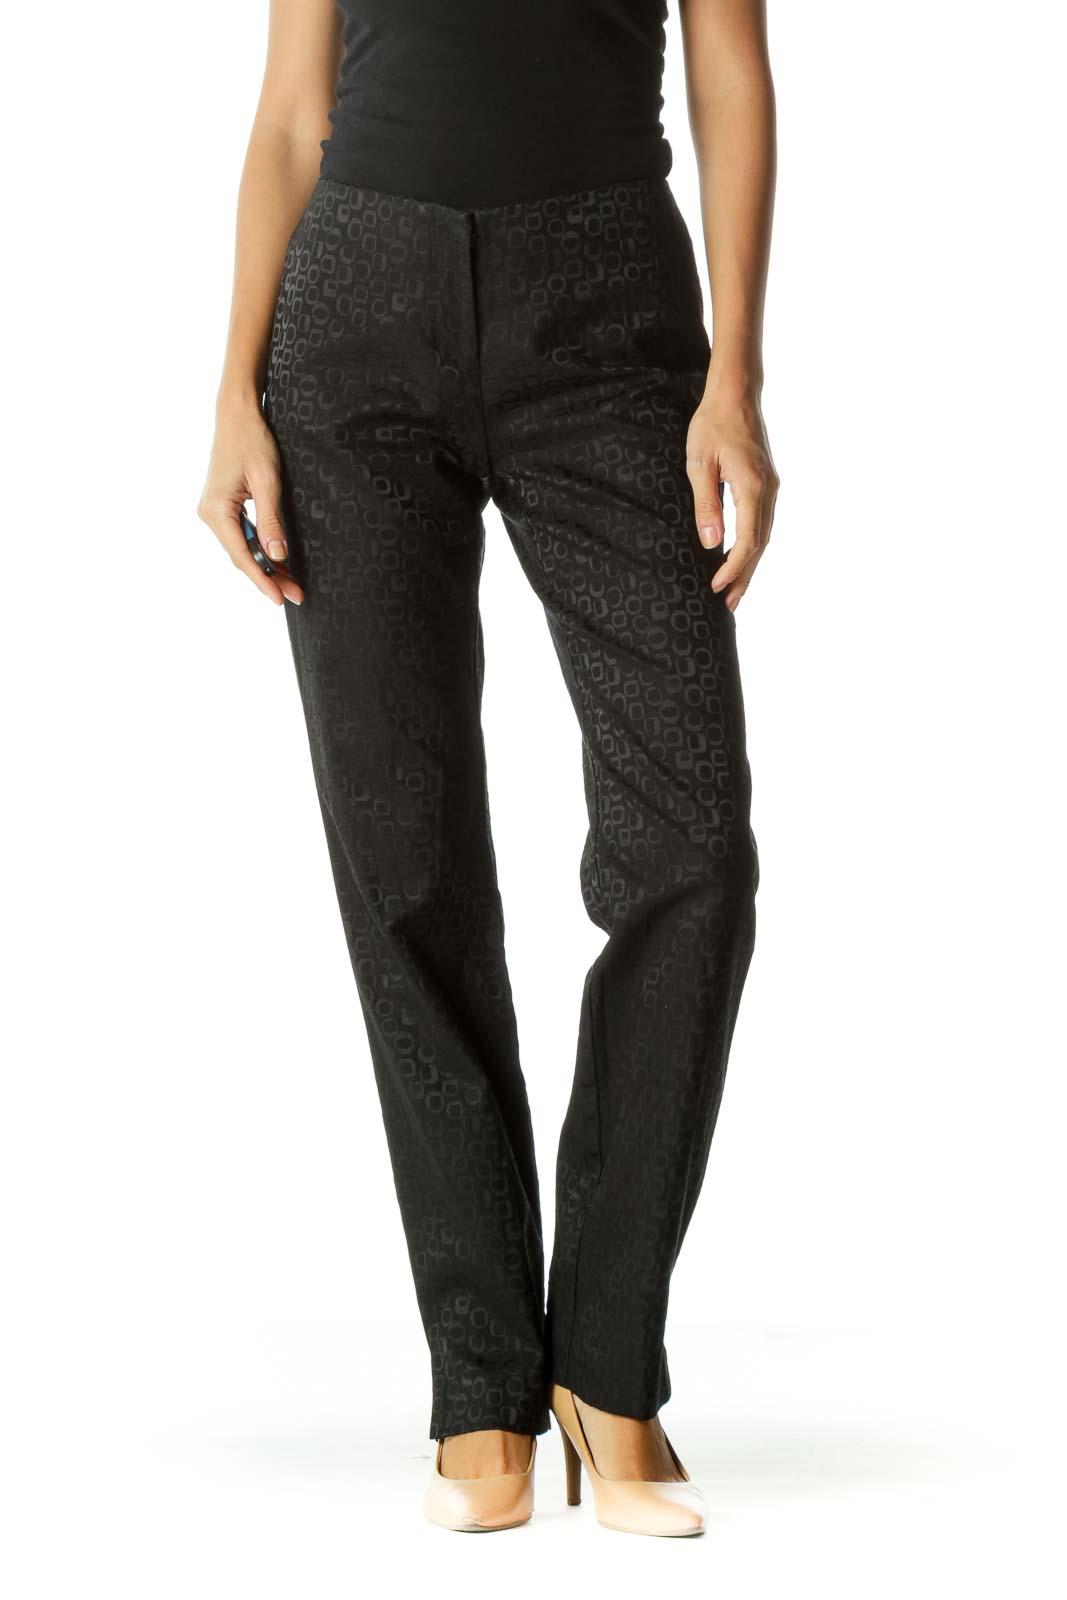 Black Jacquard Textured Print Pants Front